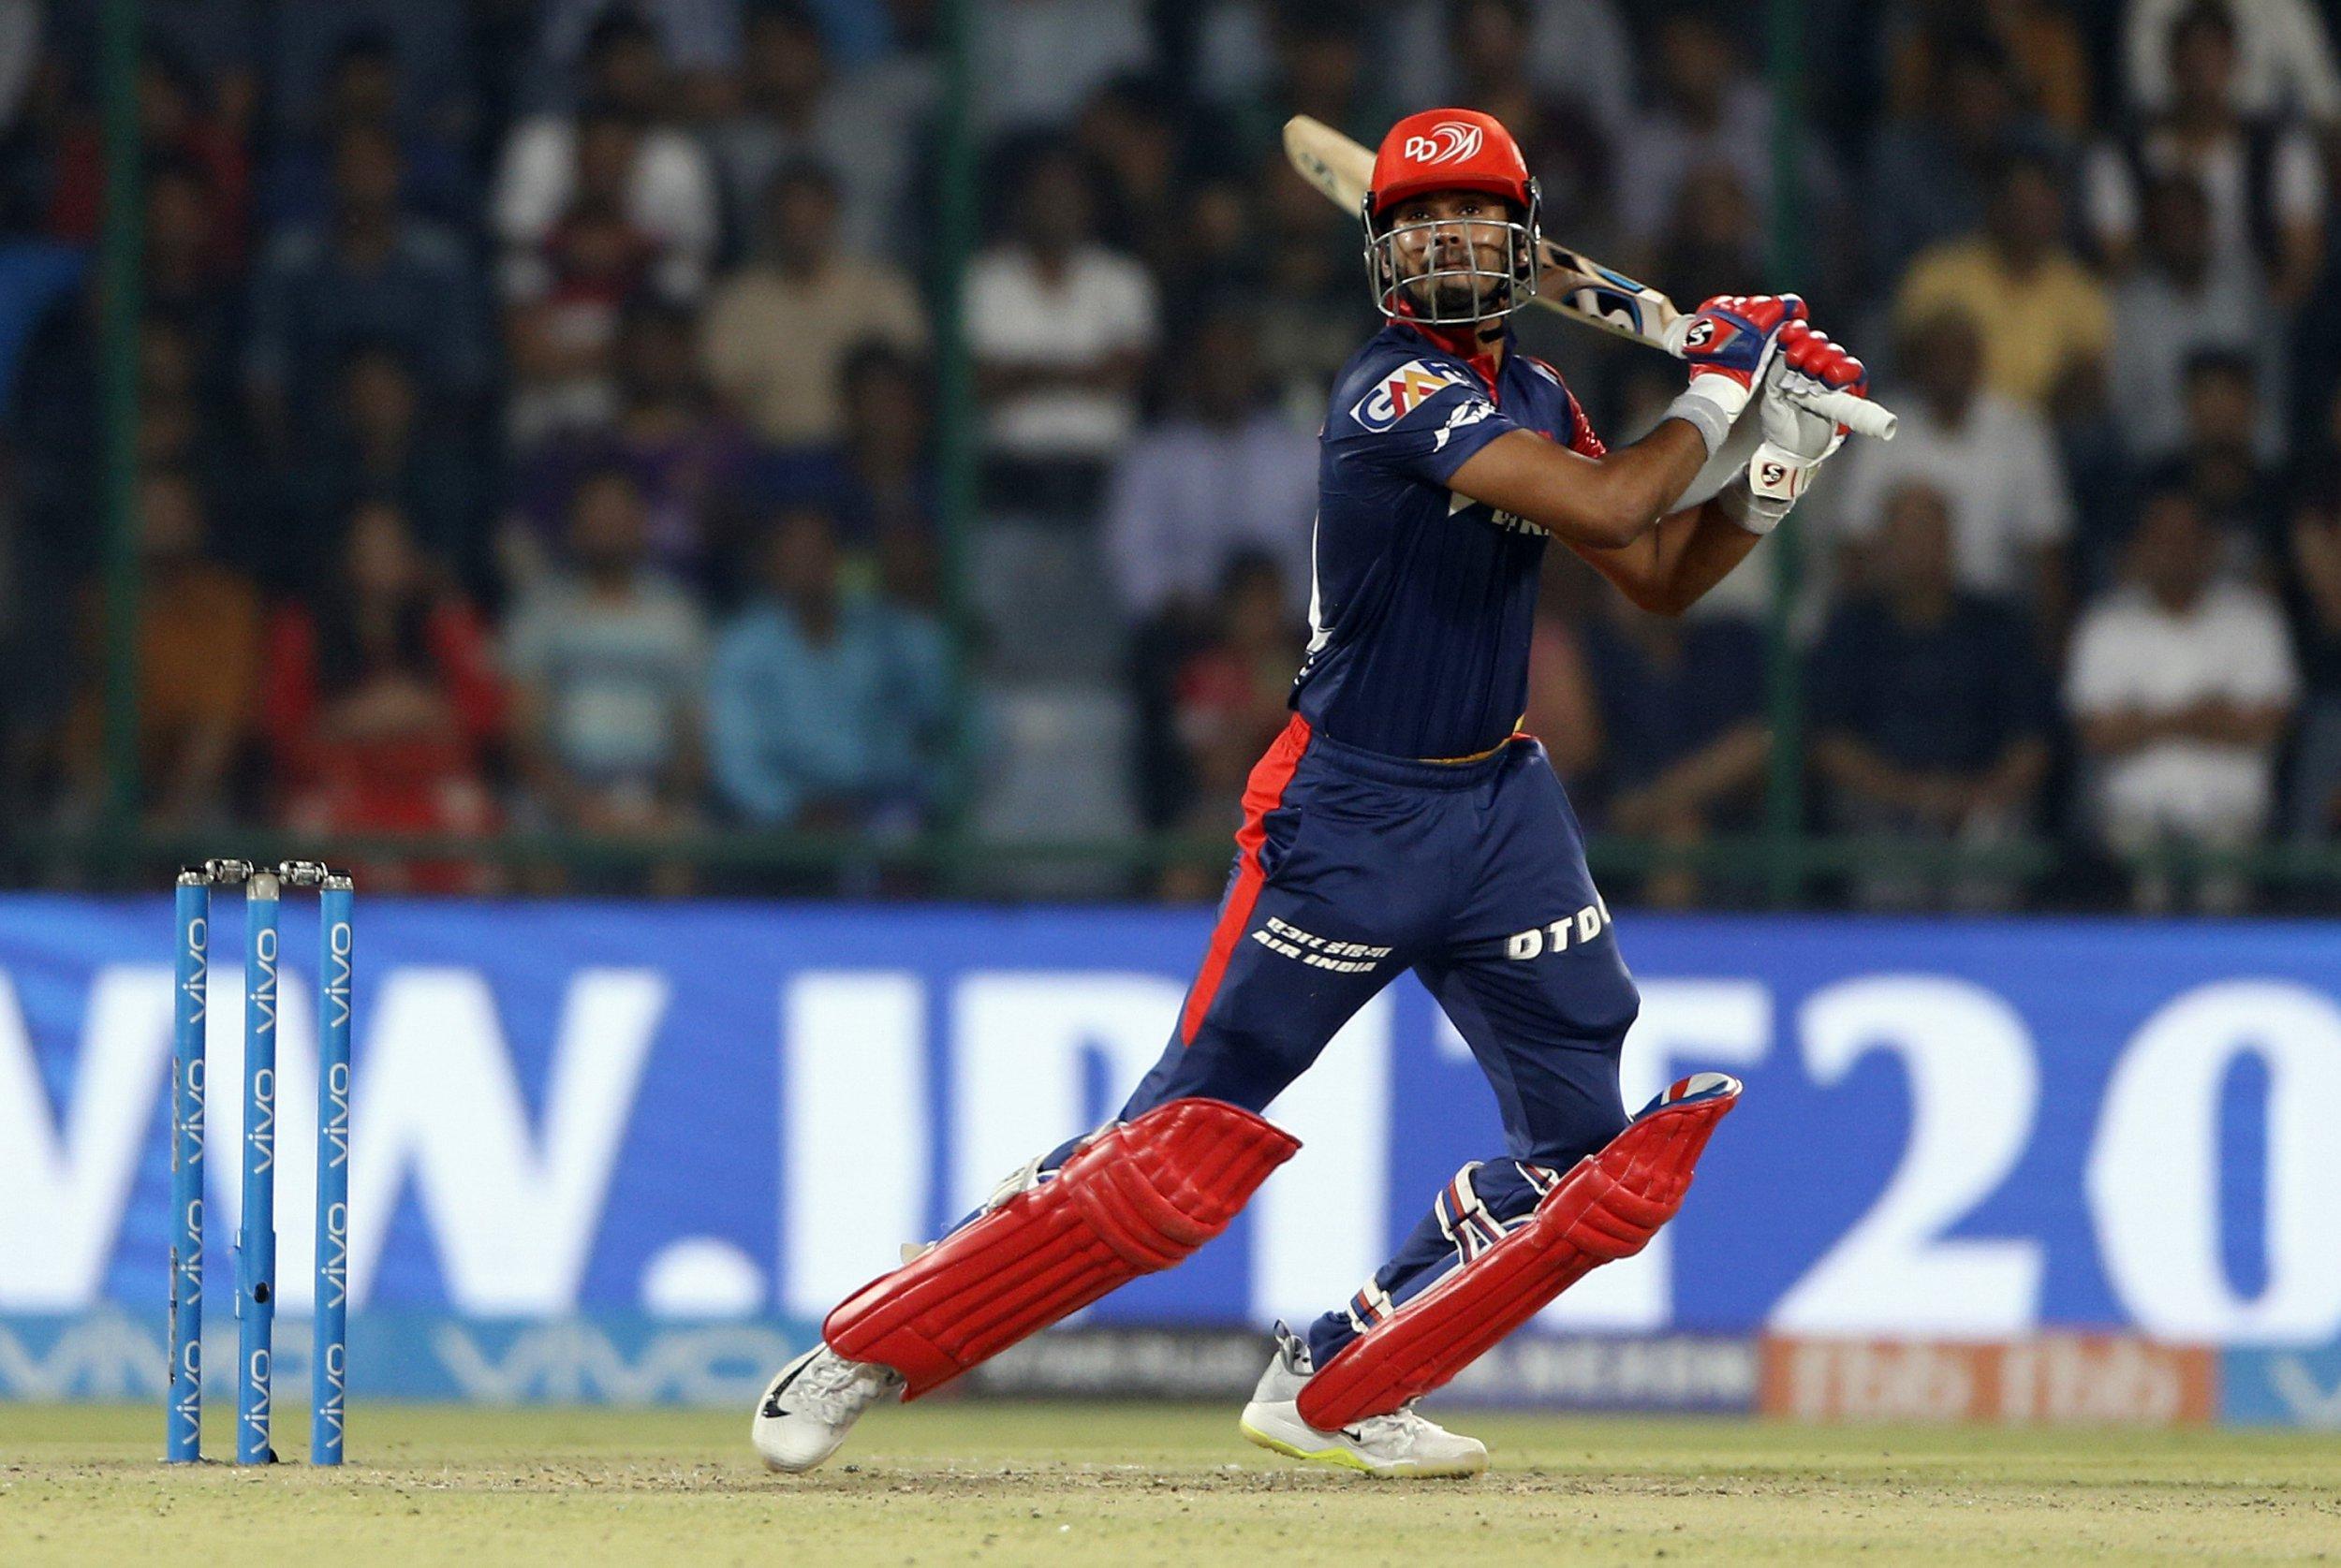 Sunrisers Hyderabad v Delhi Daredevils IPL betting preview: Shreyas Iyer and Rish Pant can prove class